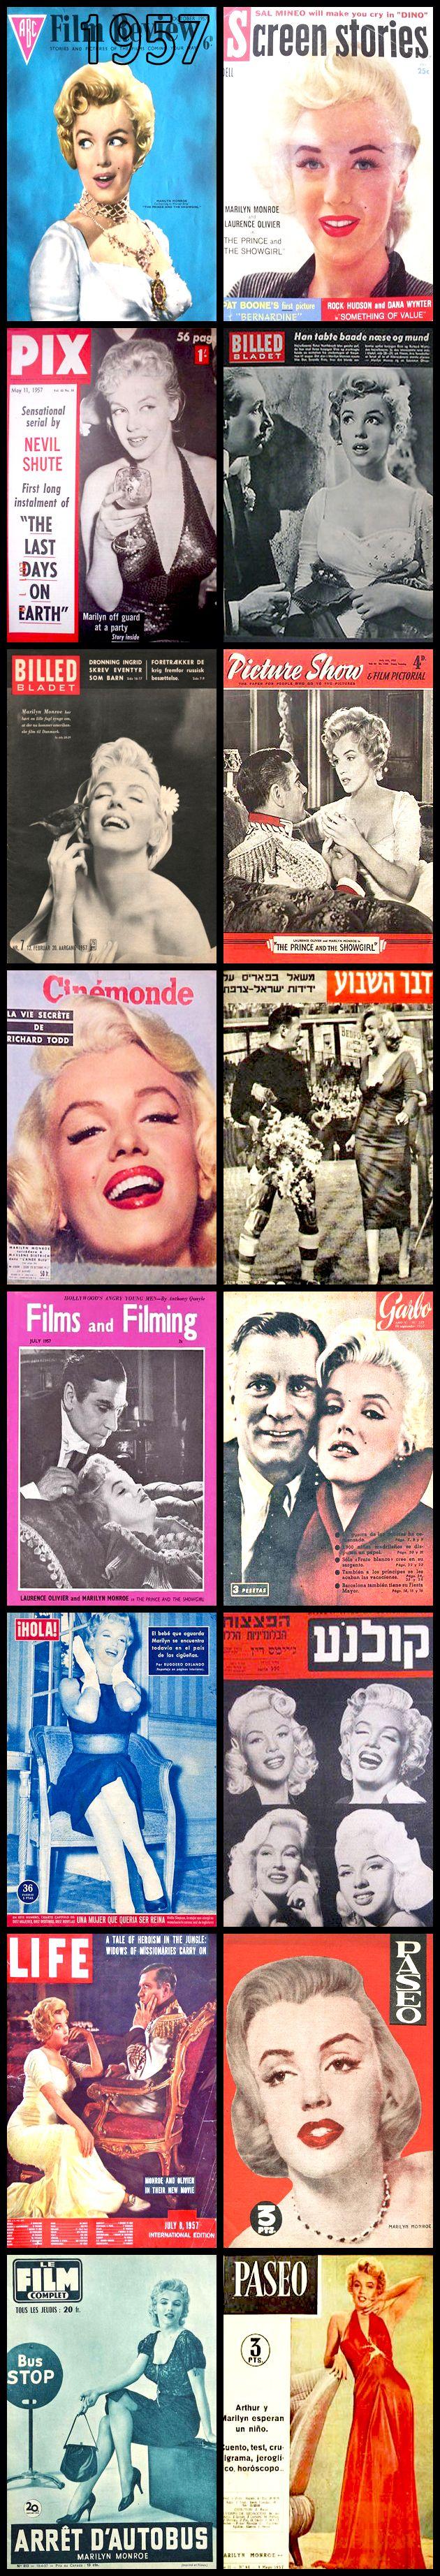 1957 magazine covers of Marilyn Monroe .... #normajeane #vintagemagazine #pinup #iconic #raremagazine #magazinecover #hollywoodactress #monroe #marilyn #1950s